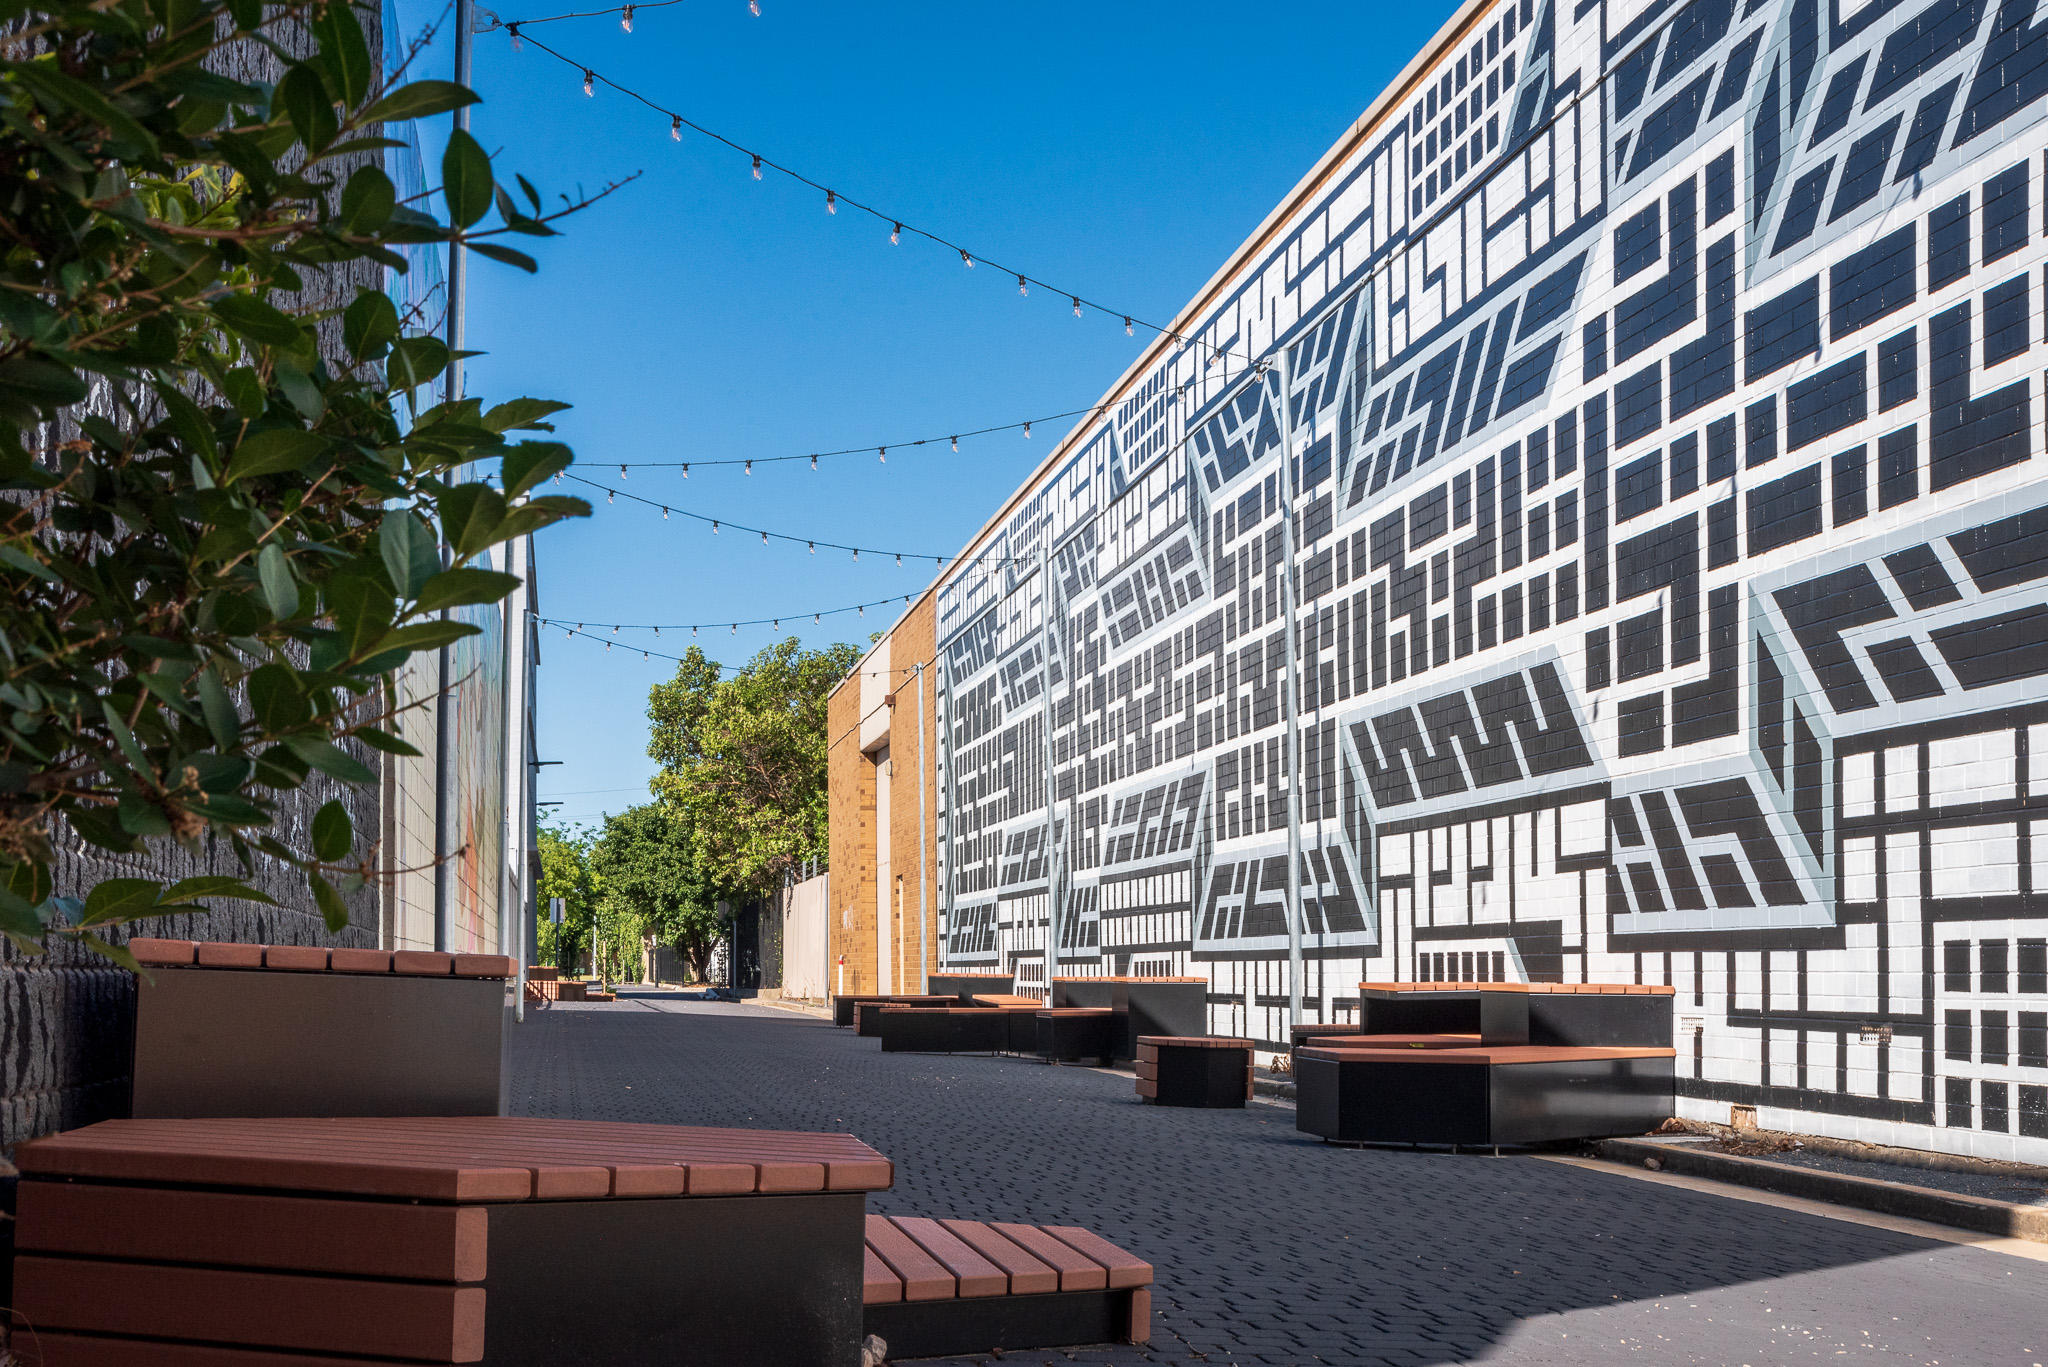 Crawford Lane, Hindmarsh, shared zone upgrade, art, seating and landscape